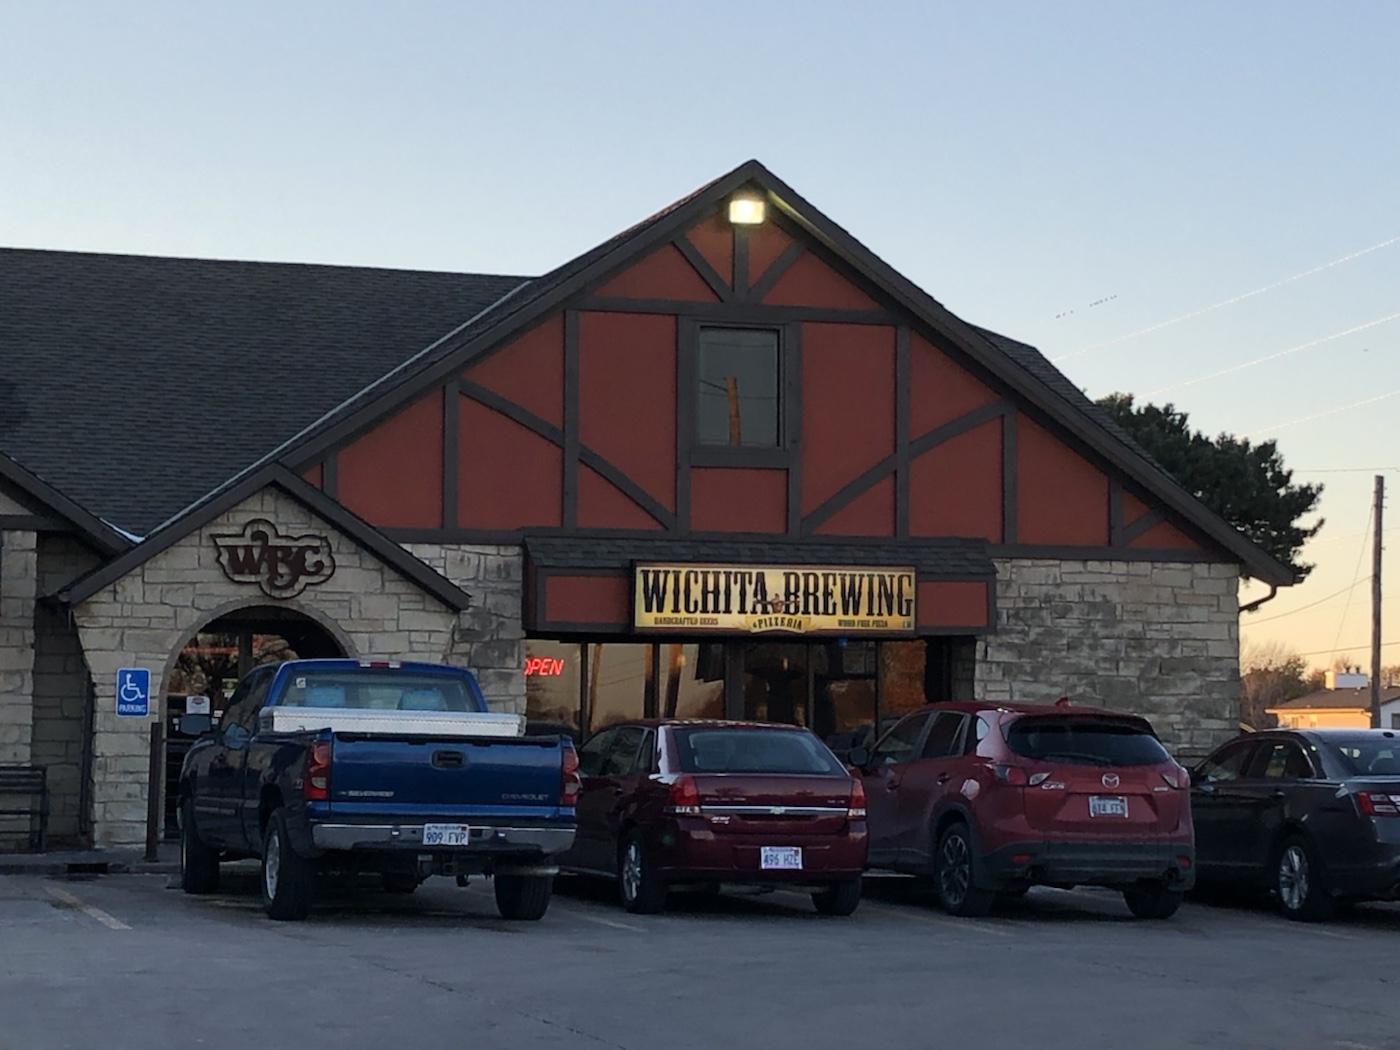 Wichita Brewing Co. & Pizzeria